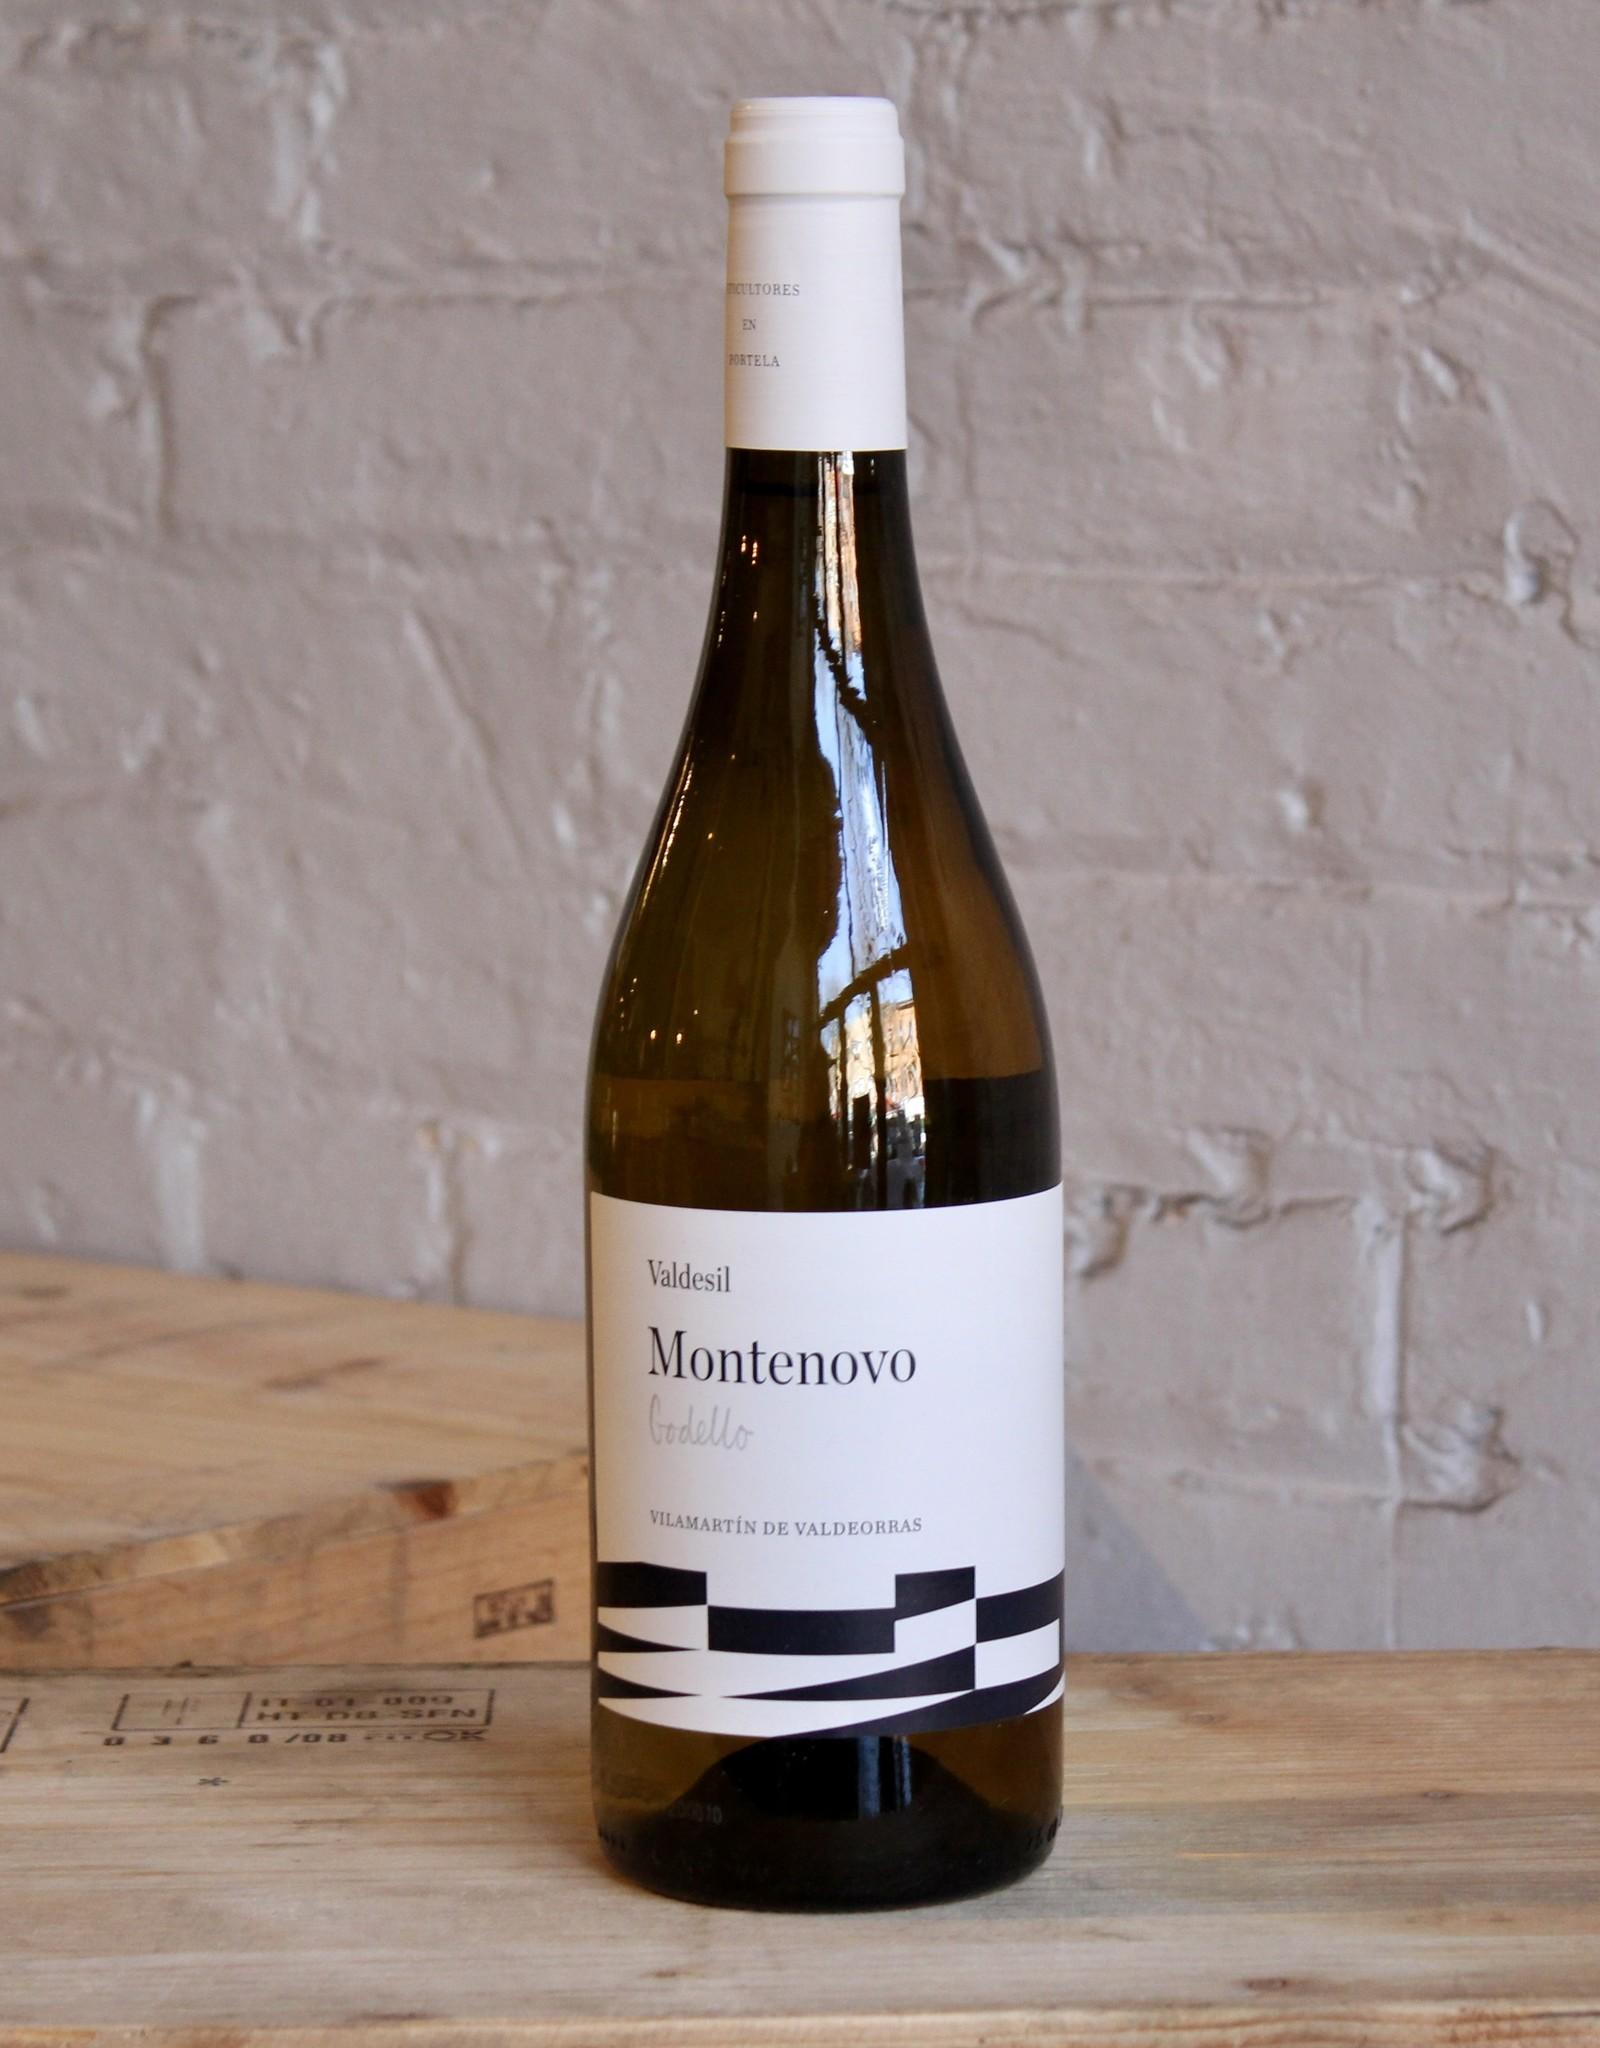 Wine 2019 Valdesil Montenovo Godello - Valdeorras, Galicia, Spain (750ml)